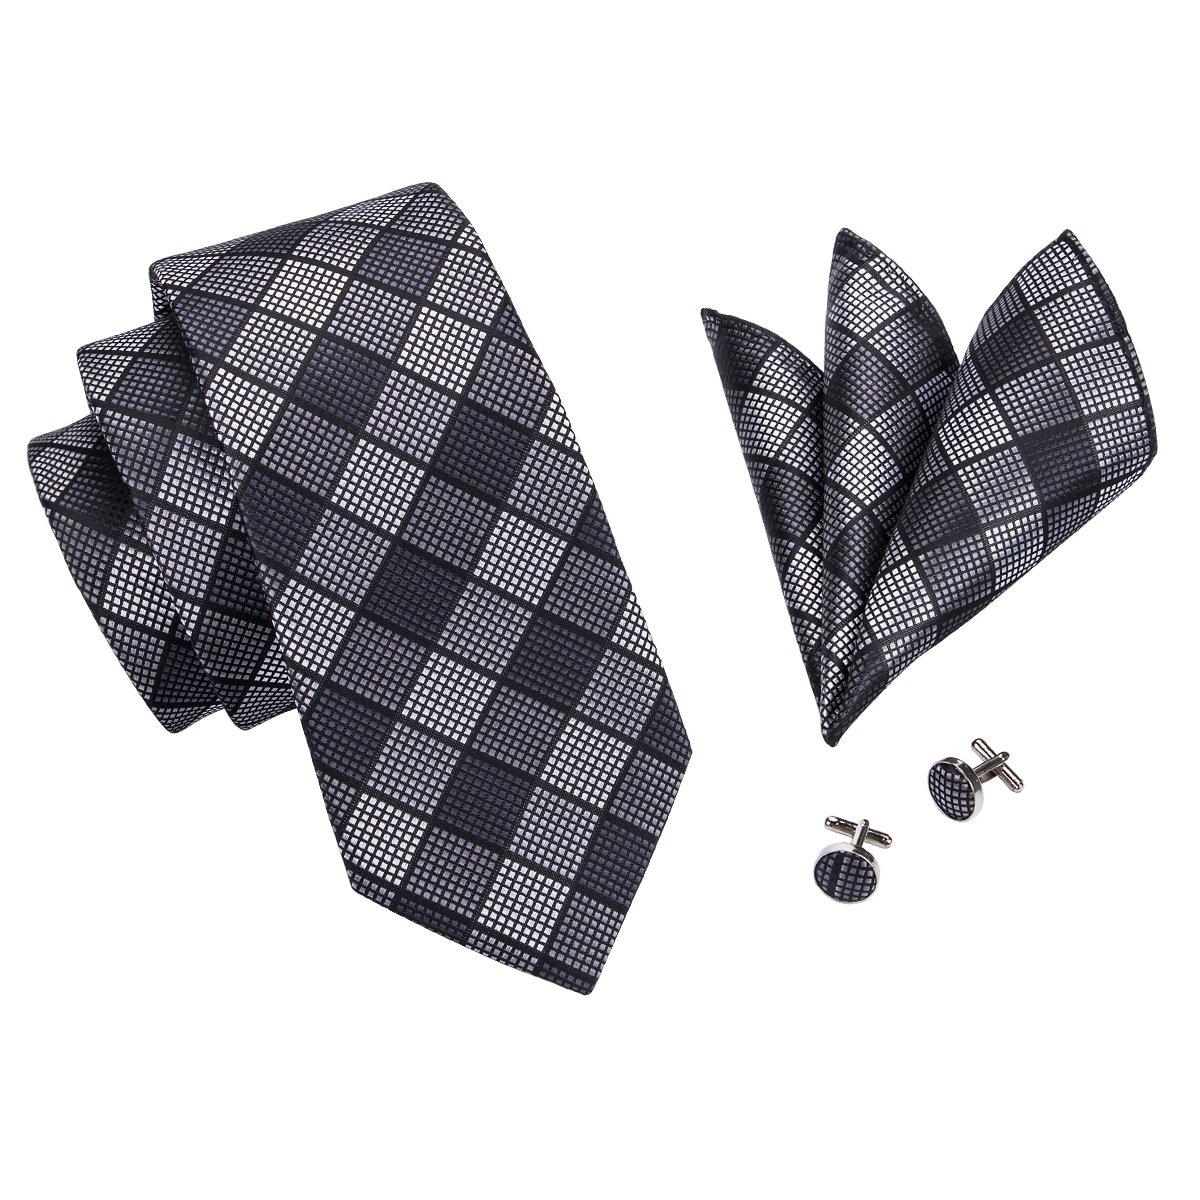 Hi-Tie Men Check Plaid Tie Necktie with Cufflinks and Pocket Square Tie Set 5K-MOKW-RXXB